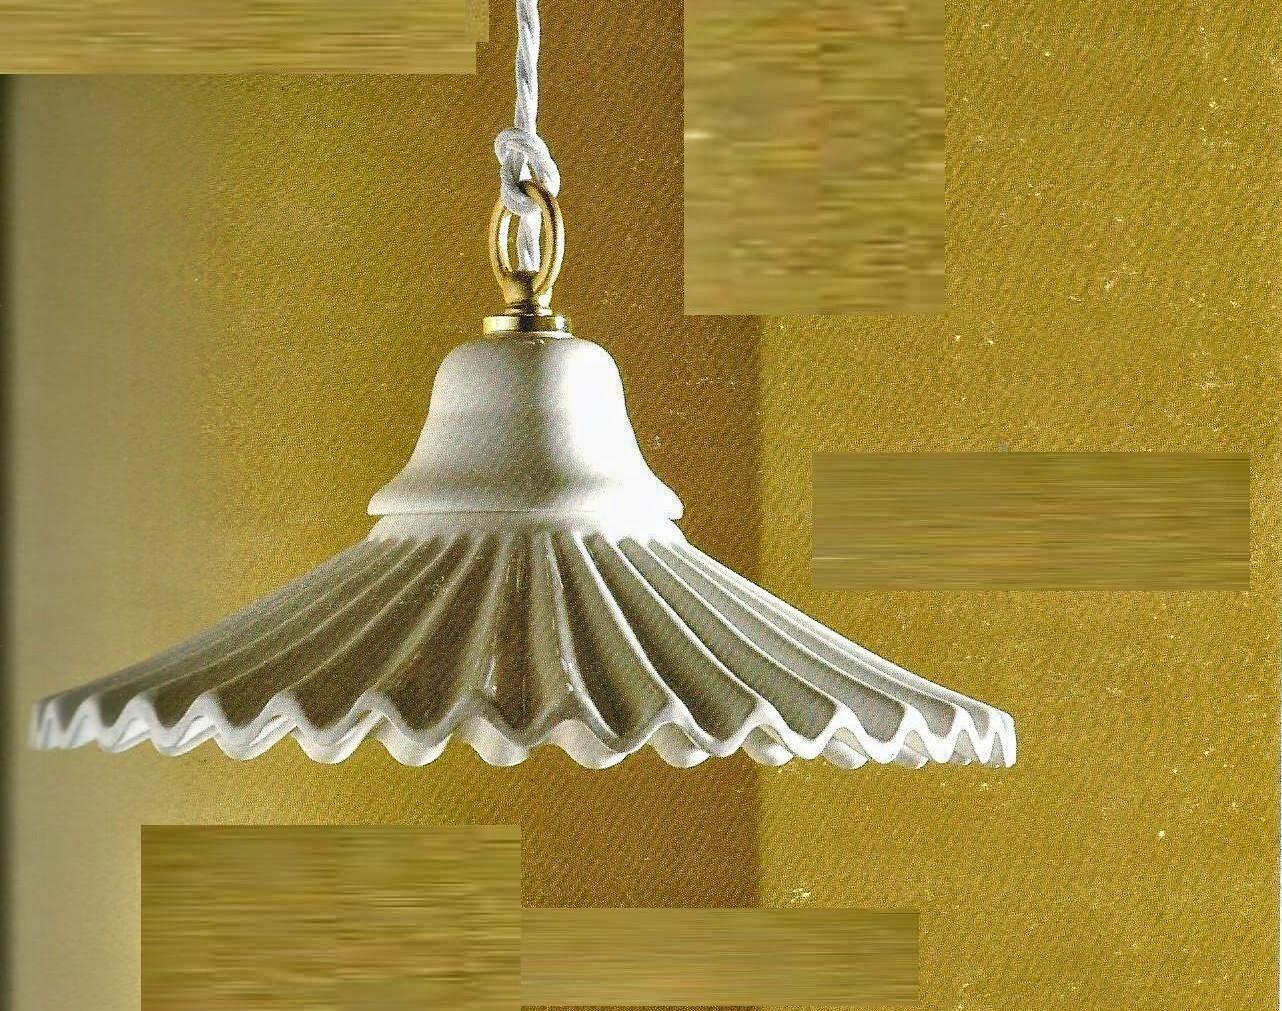 lampadari rustici ceramica : Lampadari Rustici : gennaio 2015